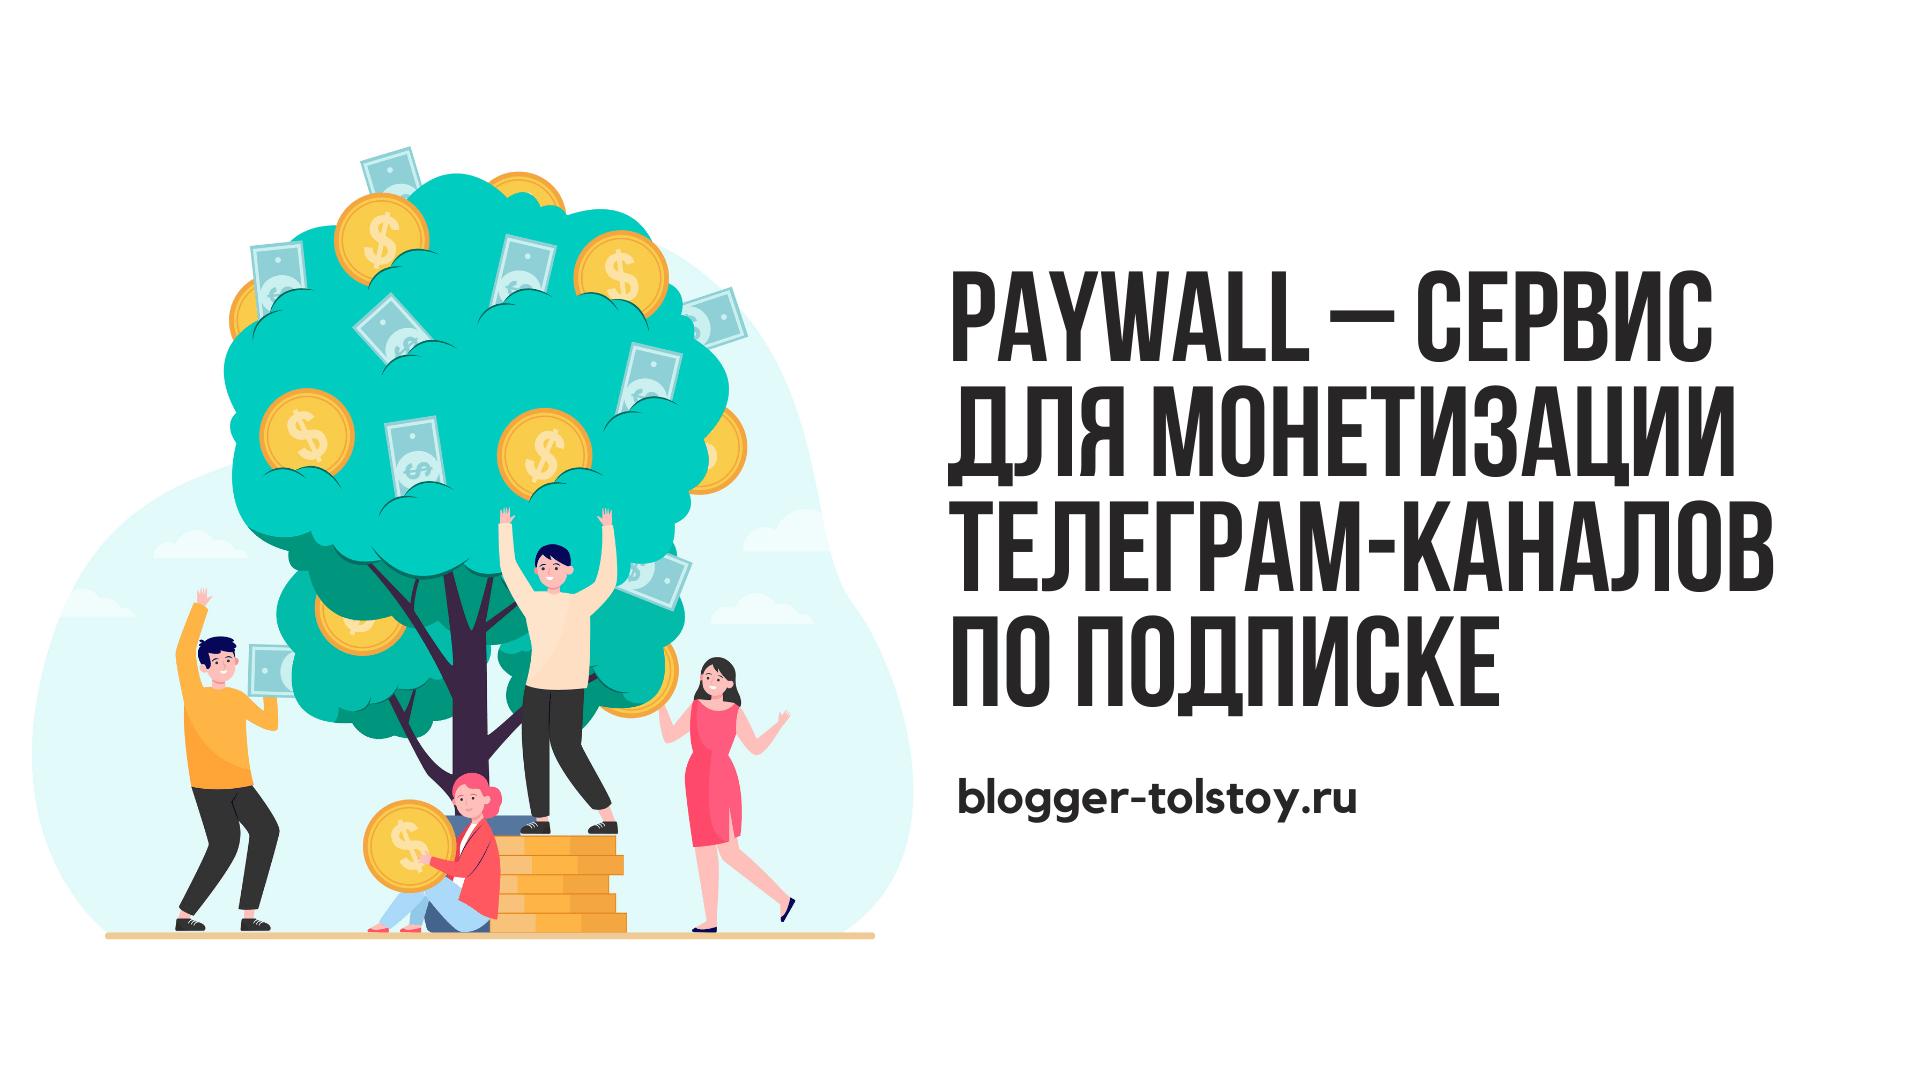 Paywall - сервис для монетизации Телеграм-каналов по подписке